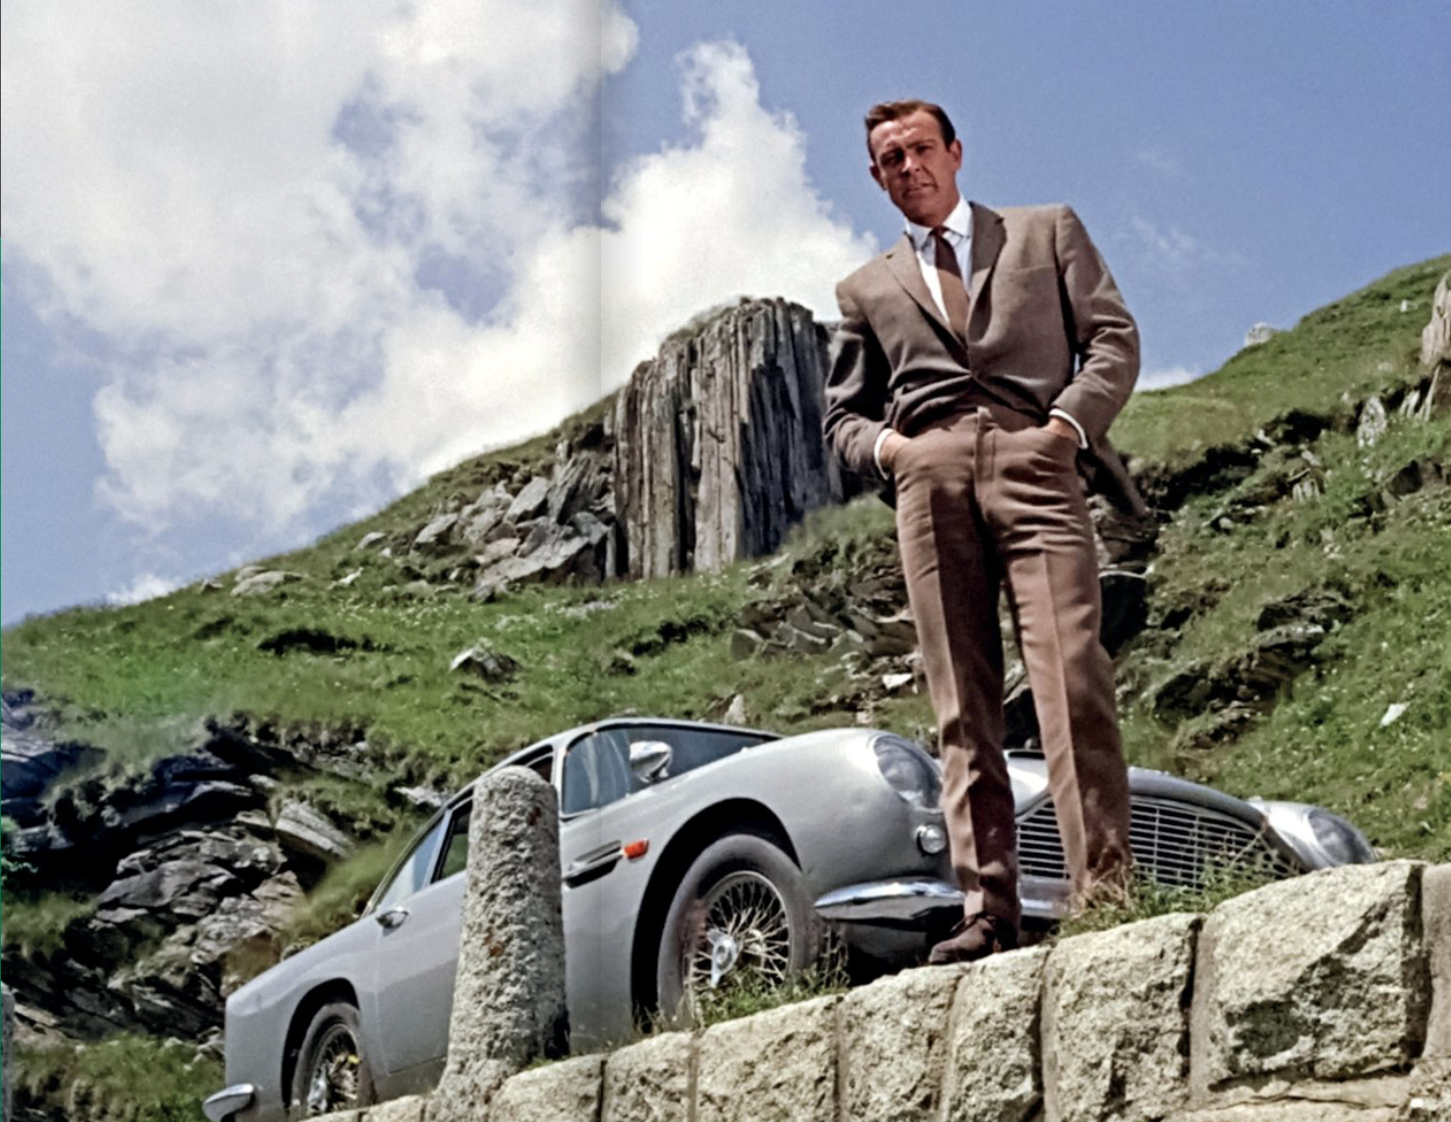 James Bond Fahrzeuge: So spannend wie die Filme selbst!